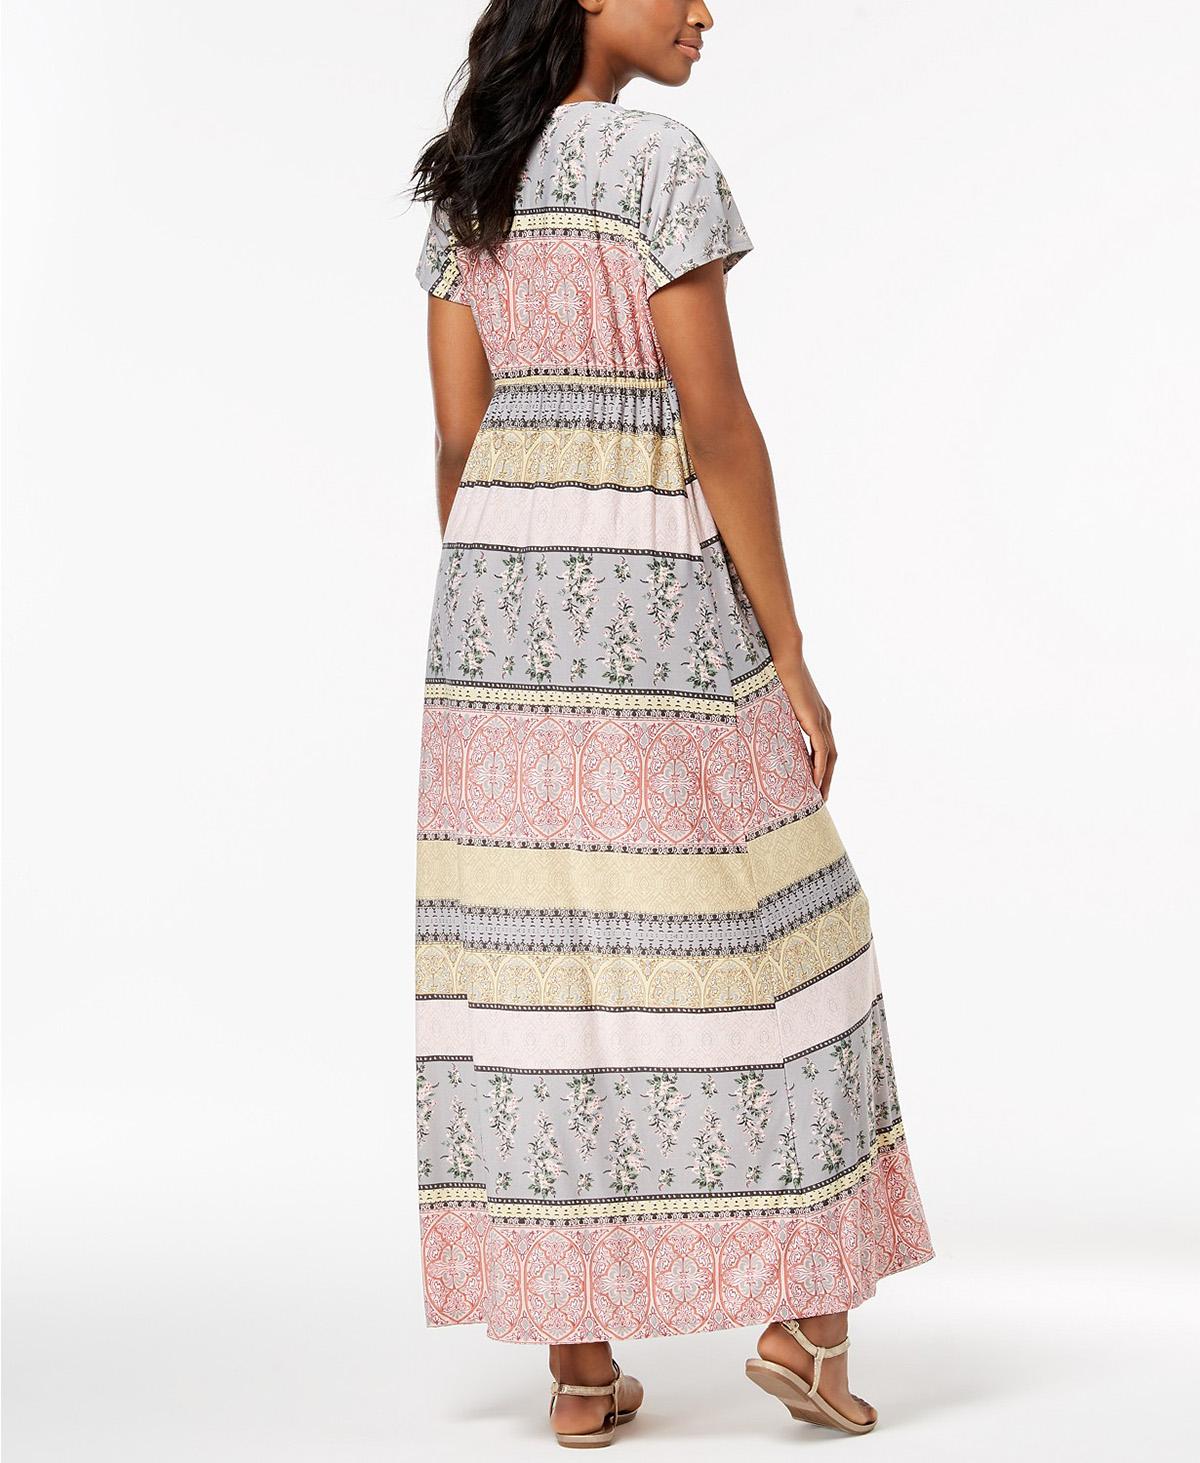 dress-two